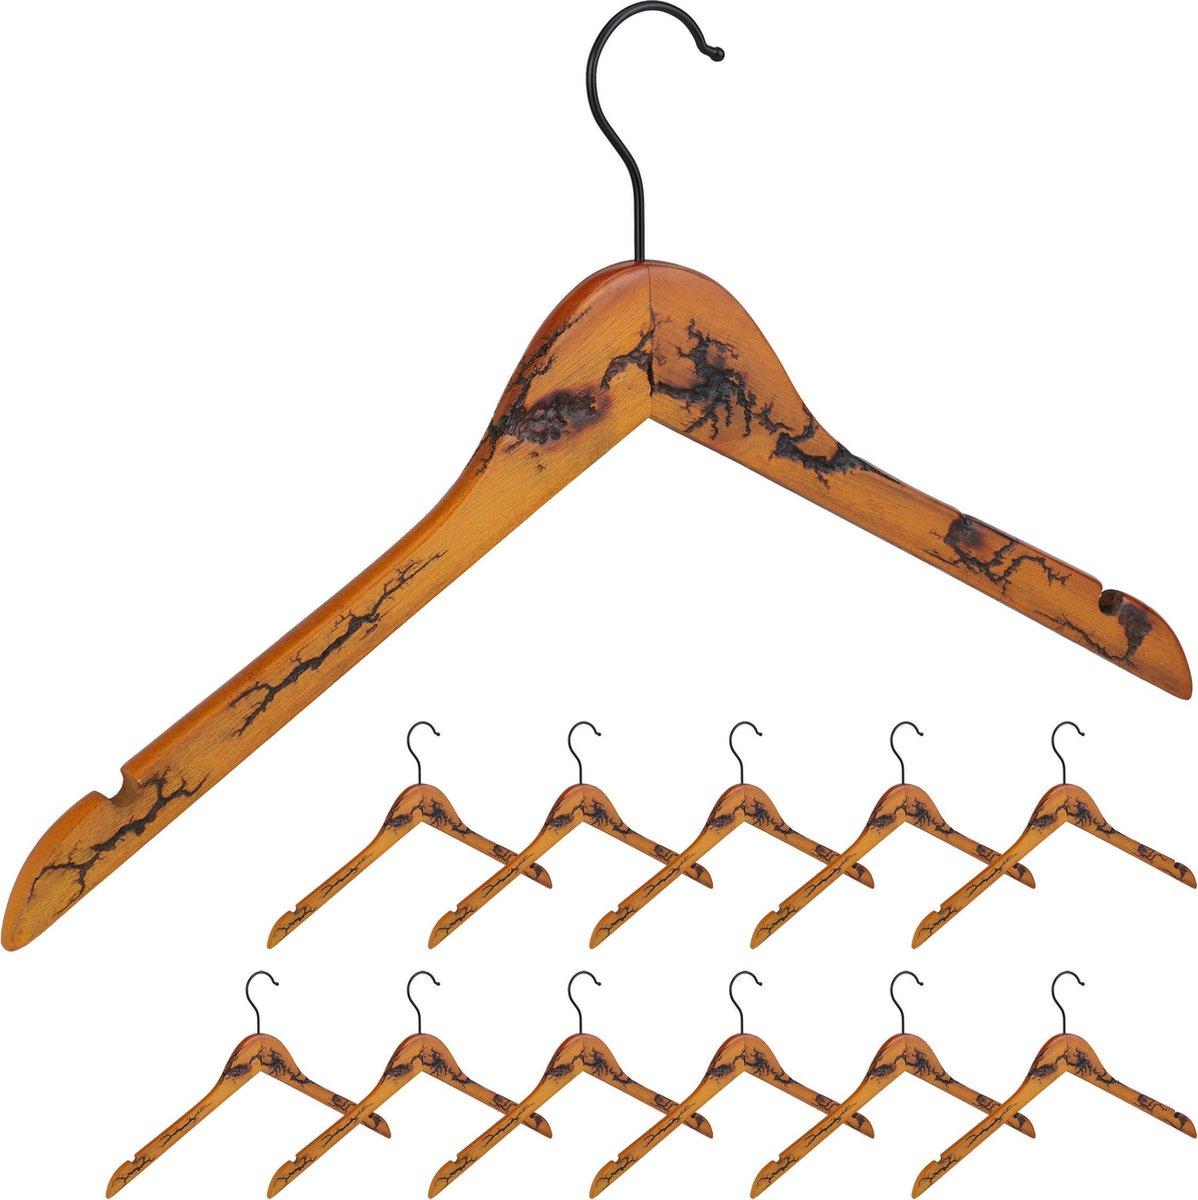 relaxdays houten kledinghangers - 5 stuks - kleerhangers hout - jashanger  - vintage - rok